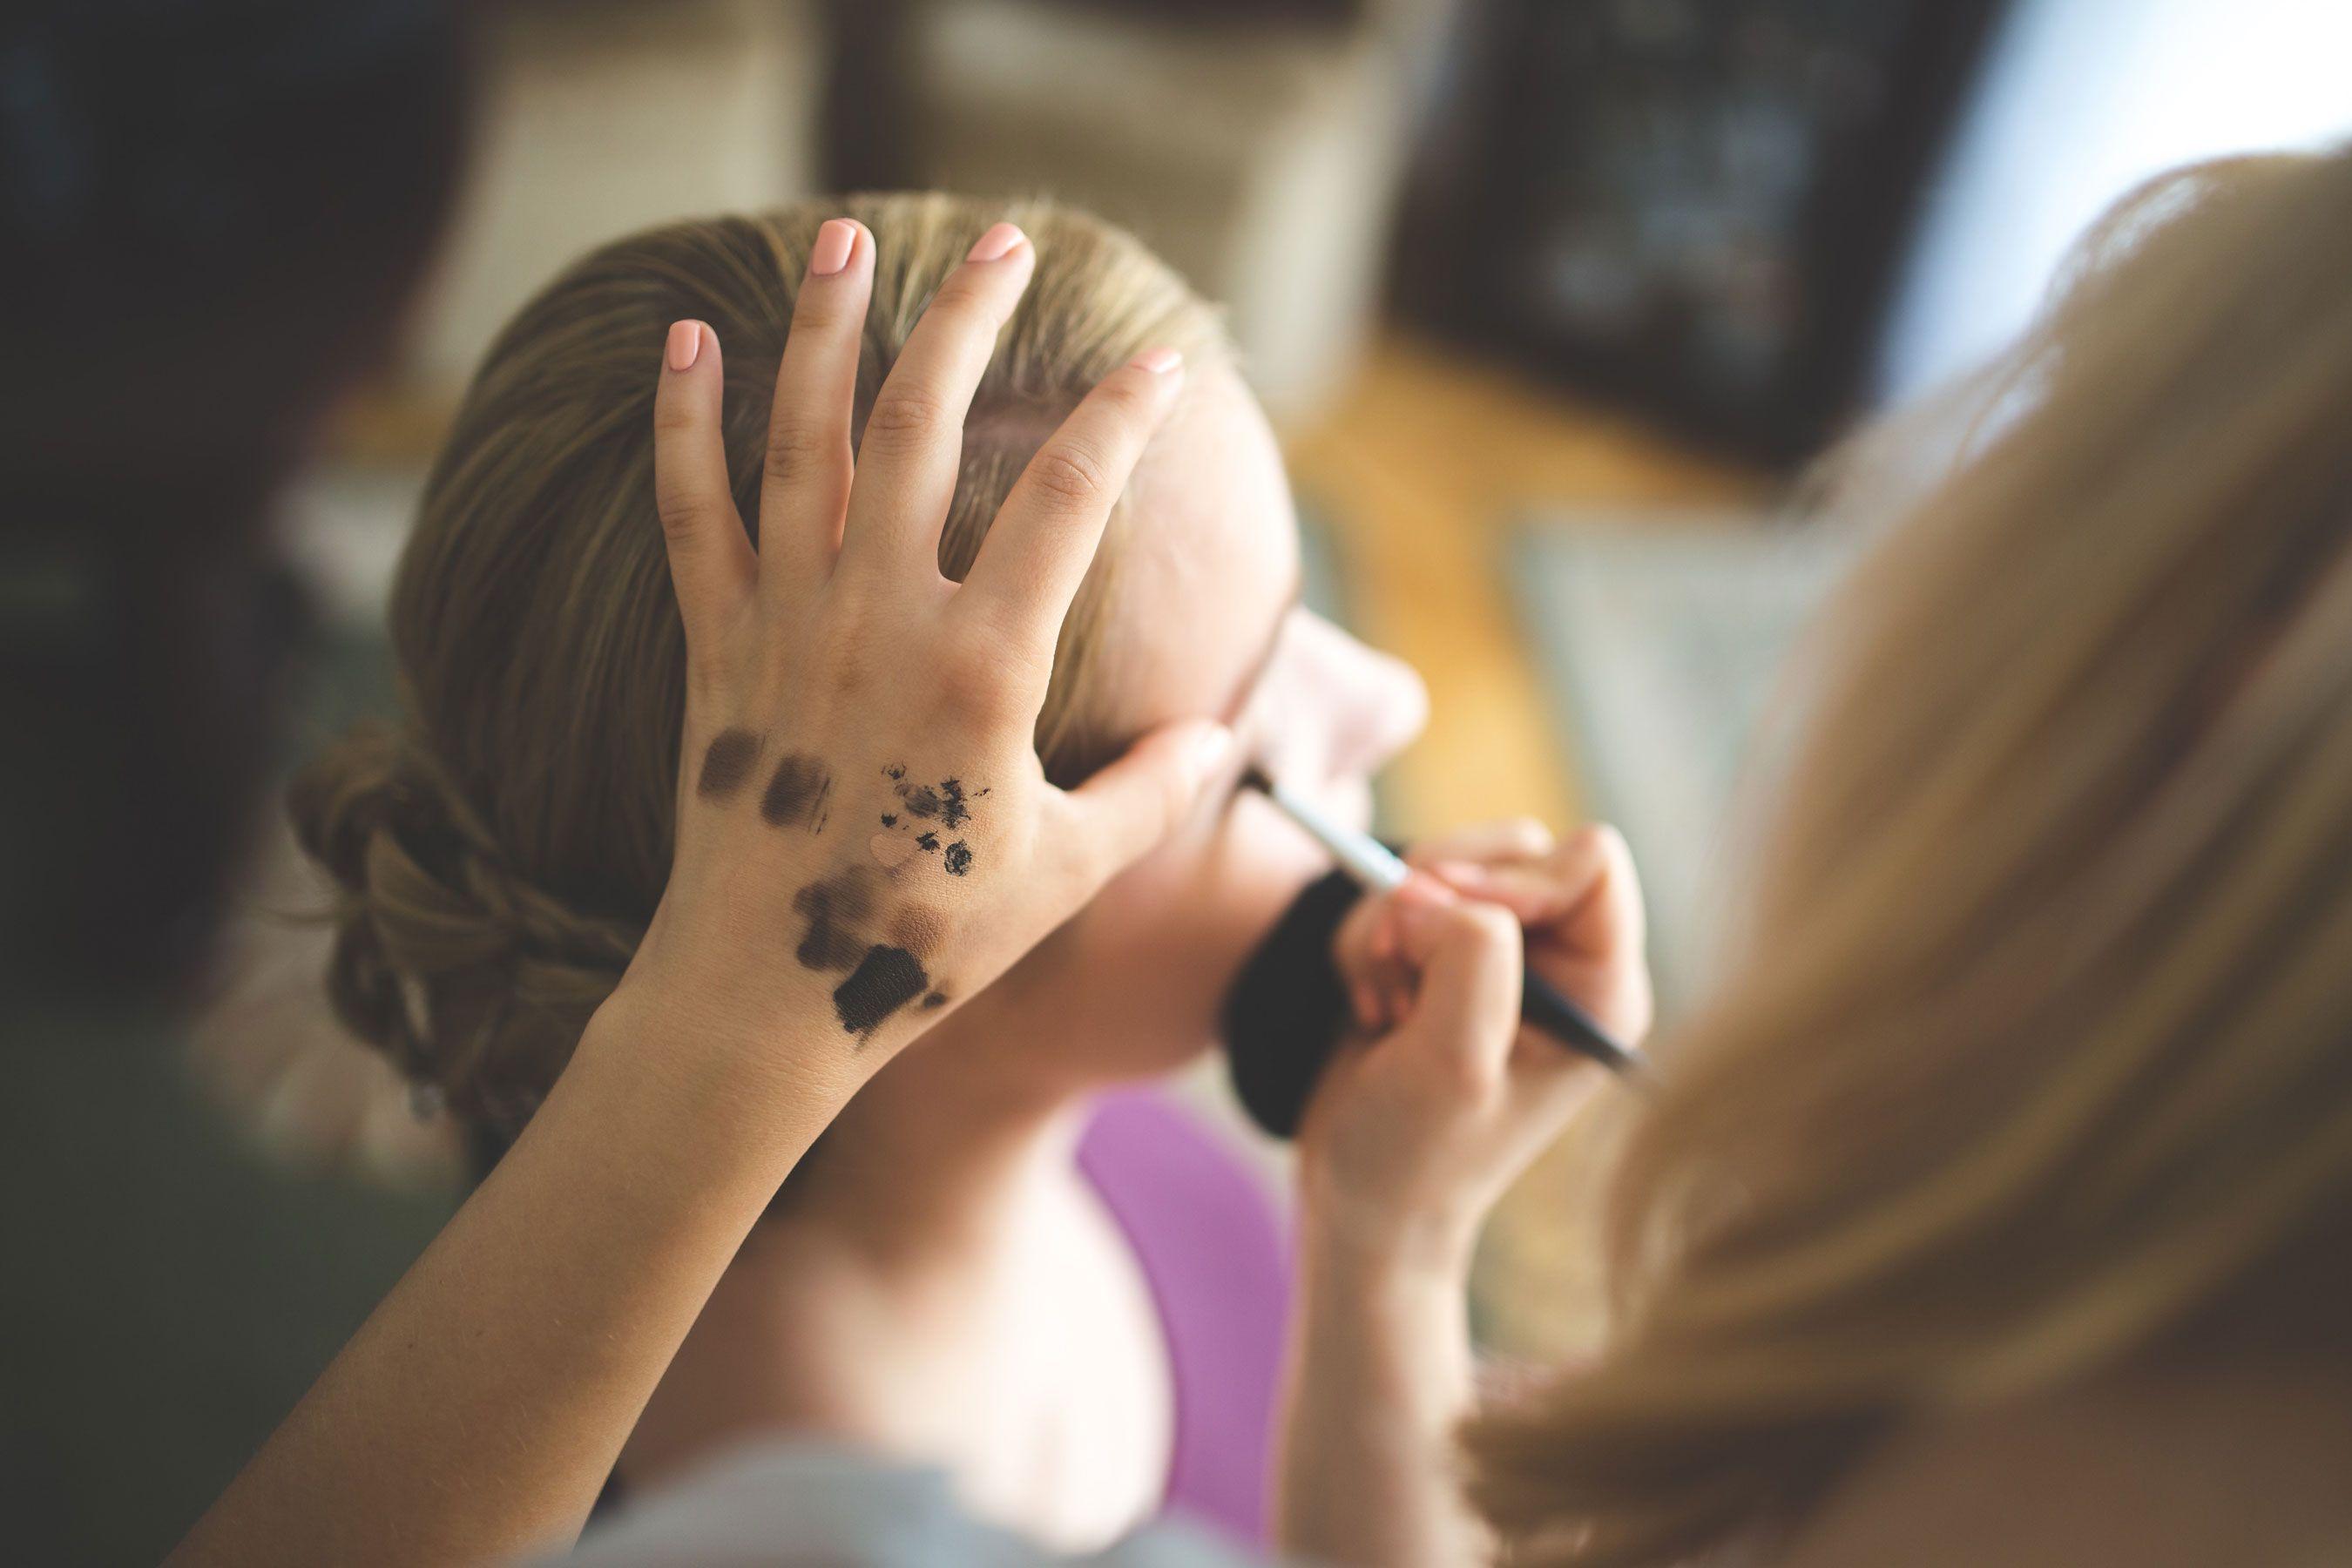 Bridal Makeup and Hair Salon in Cicero, New York